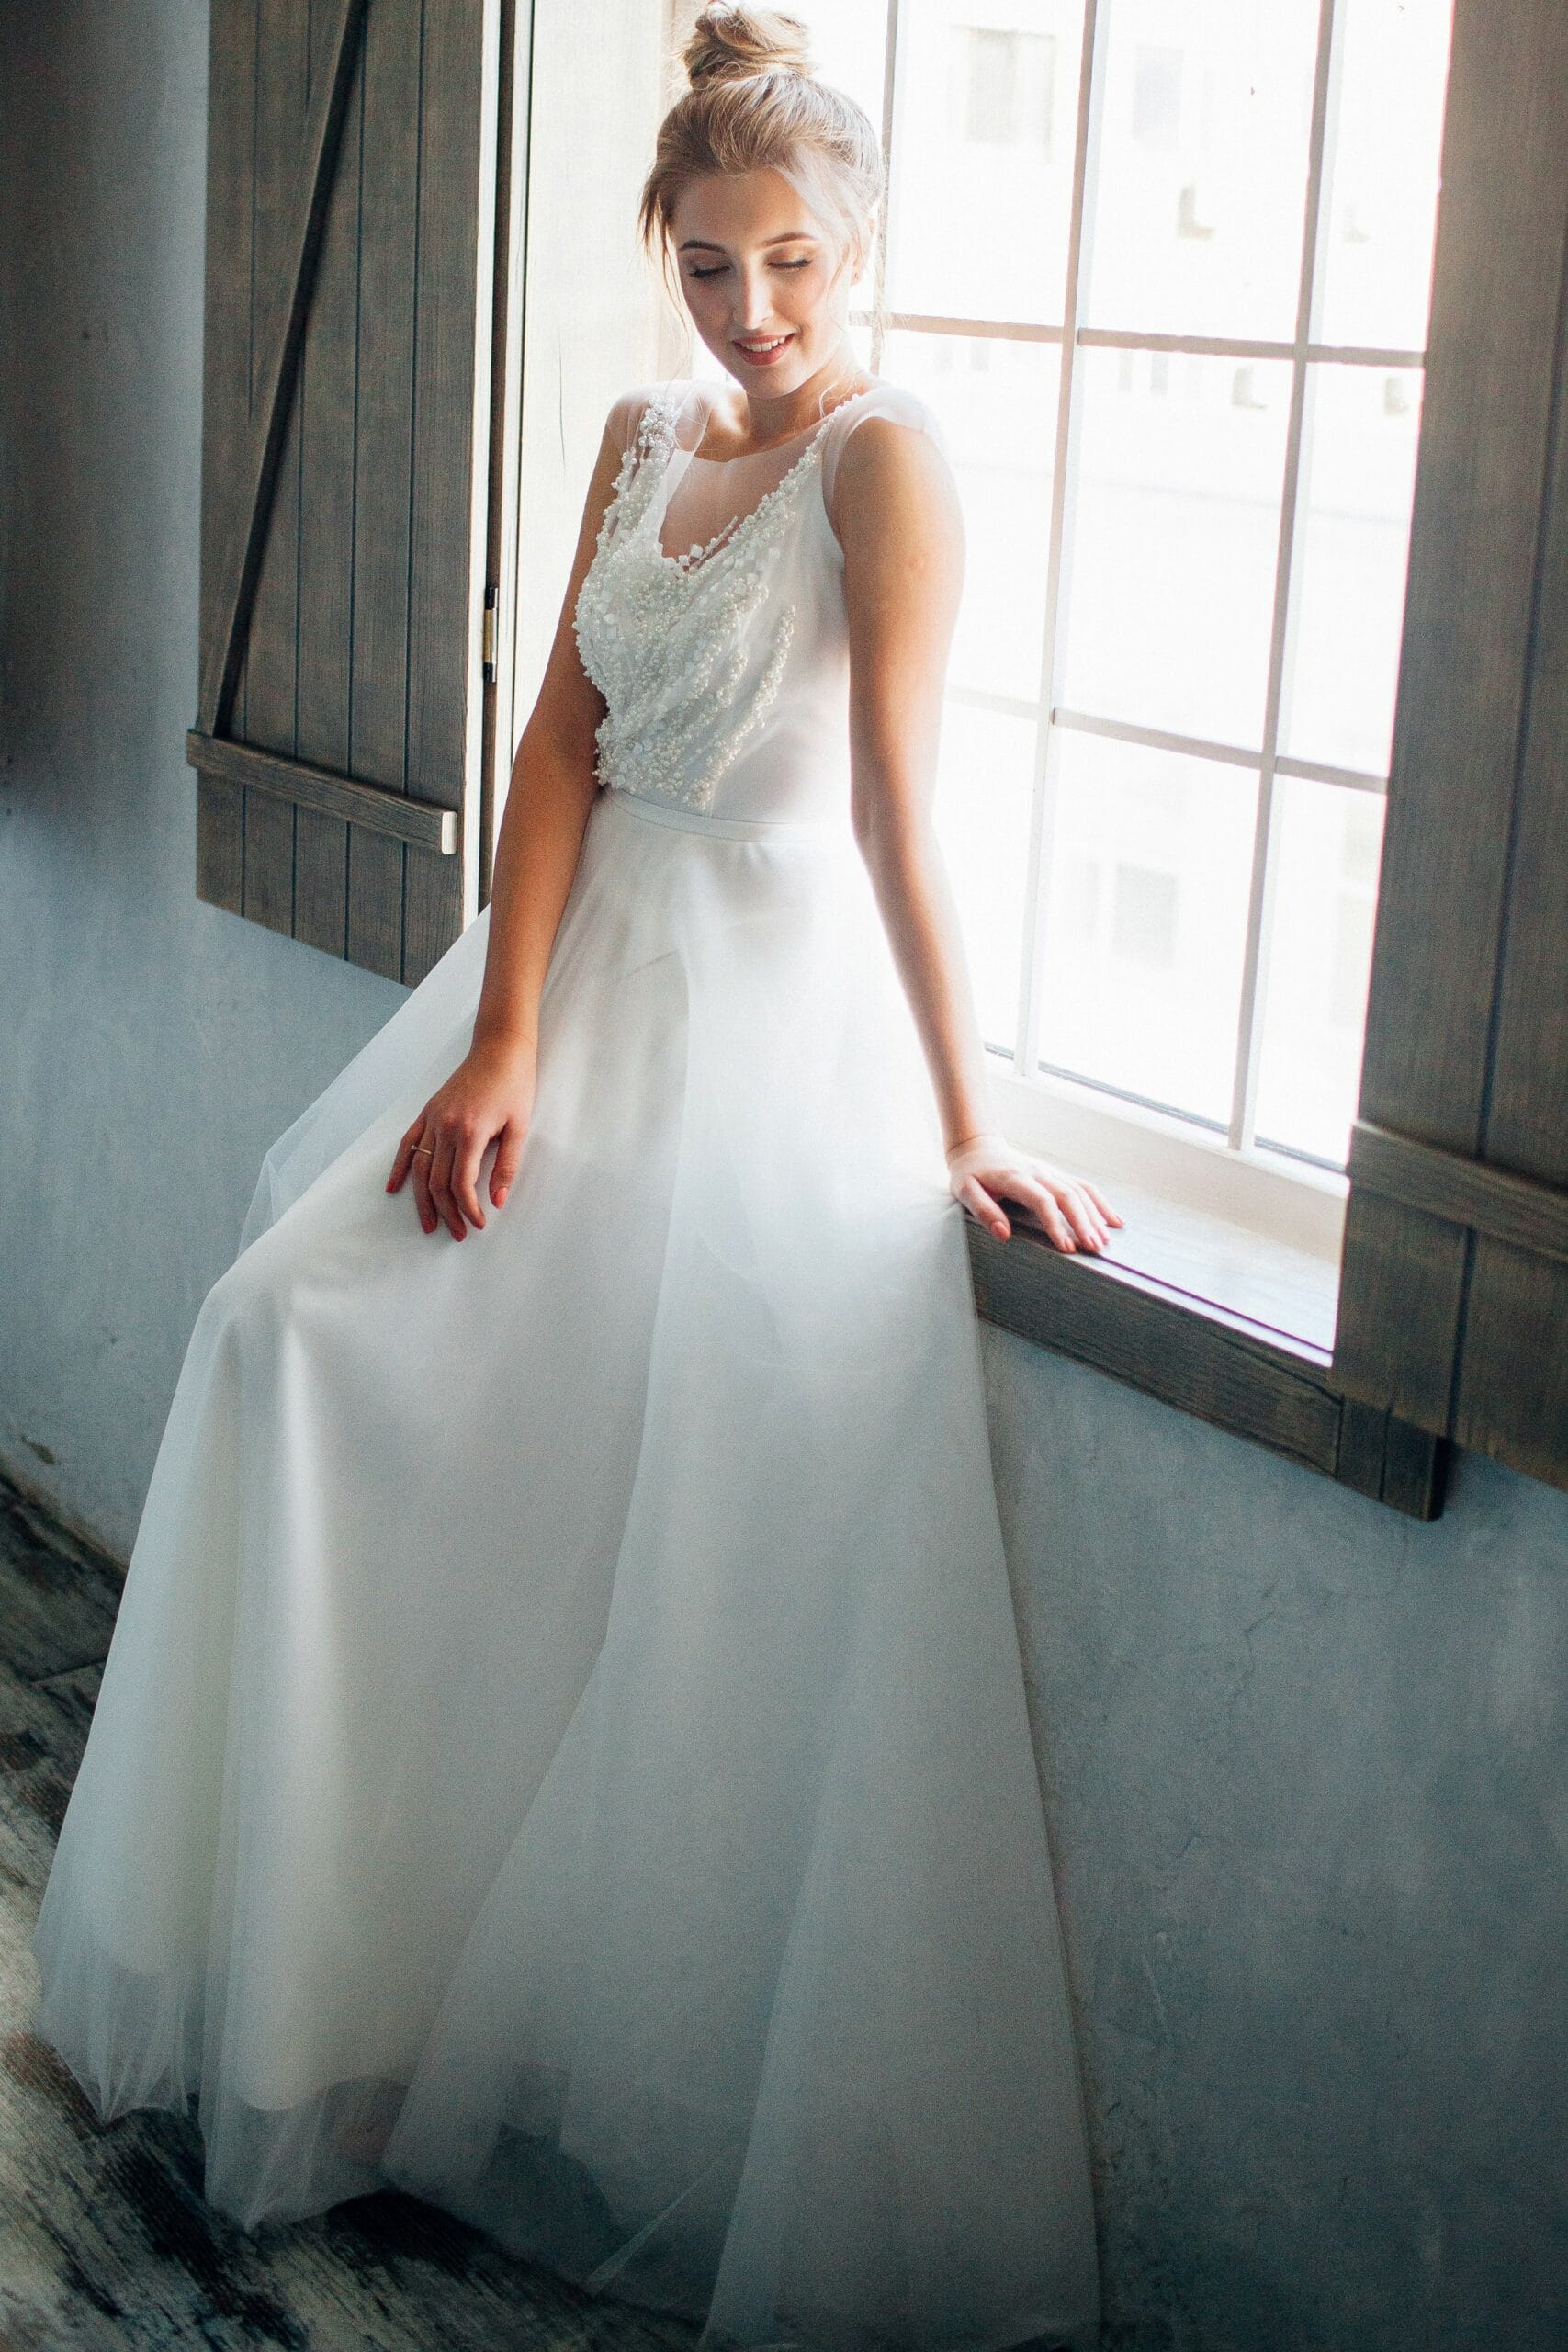 Свадебное платье MURIELA, коллекция THE ANGELS, бренд RARE BRIDAL, фото 5